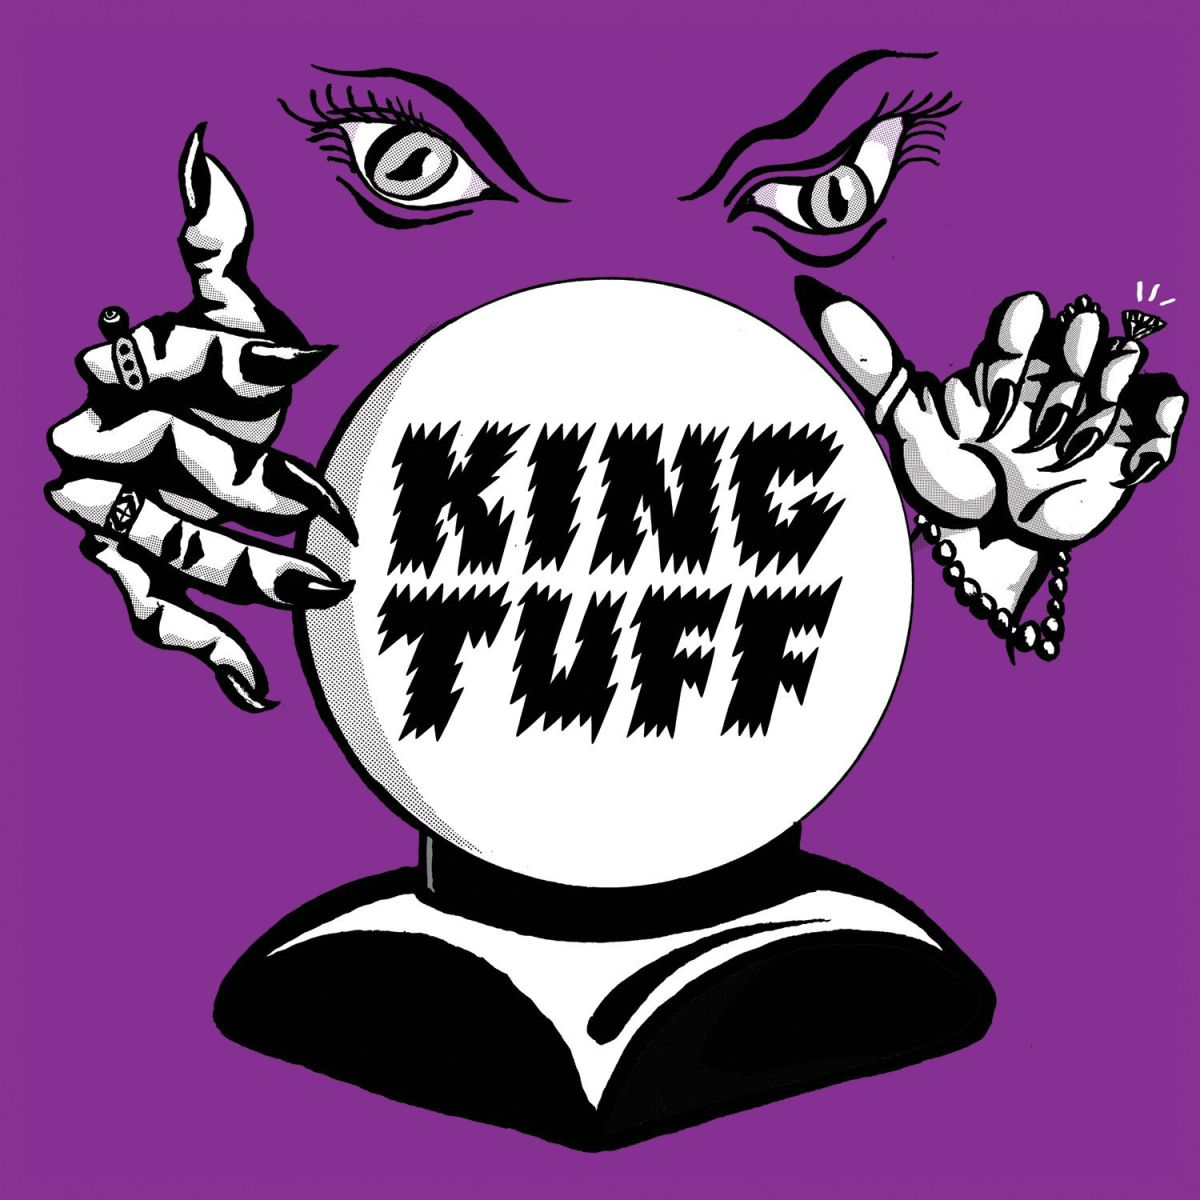 KING TUFF   Black Moon Spell, 2014, Bobby Harlow, 41:00